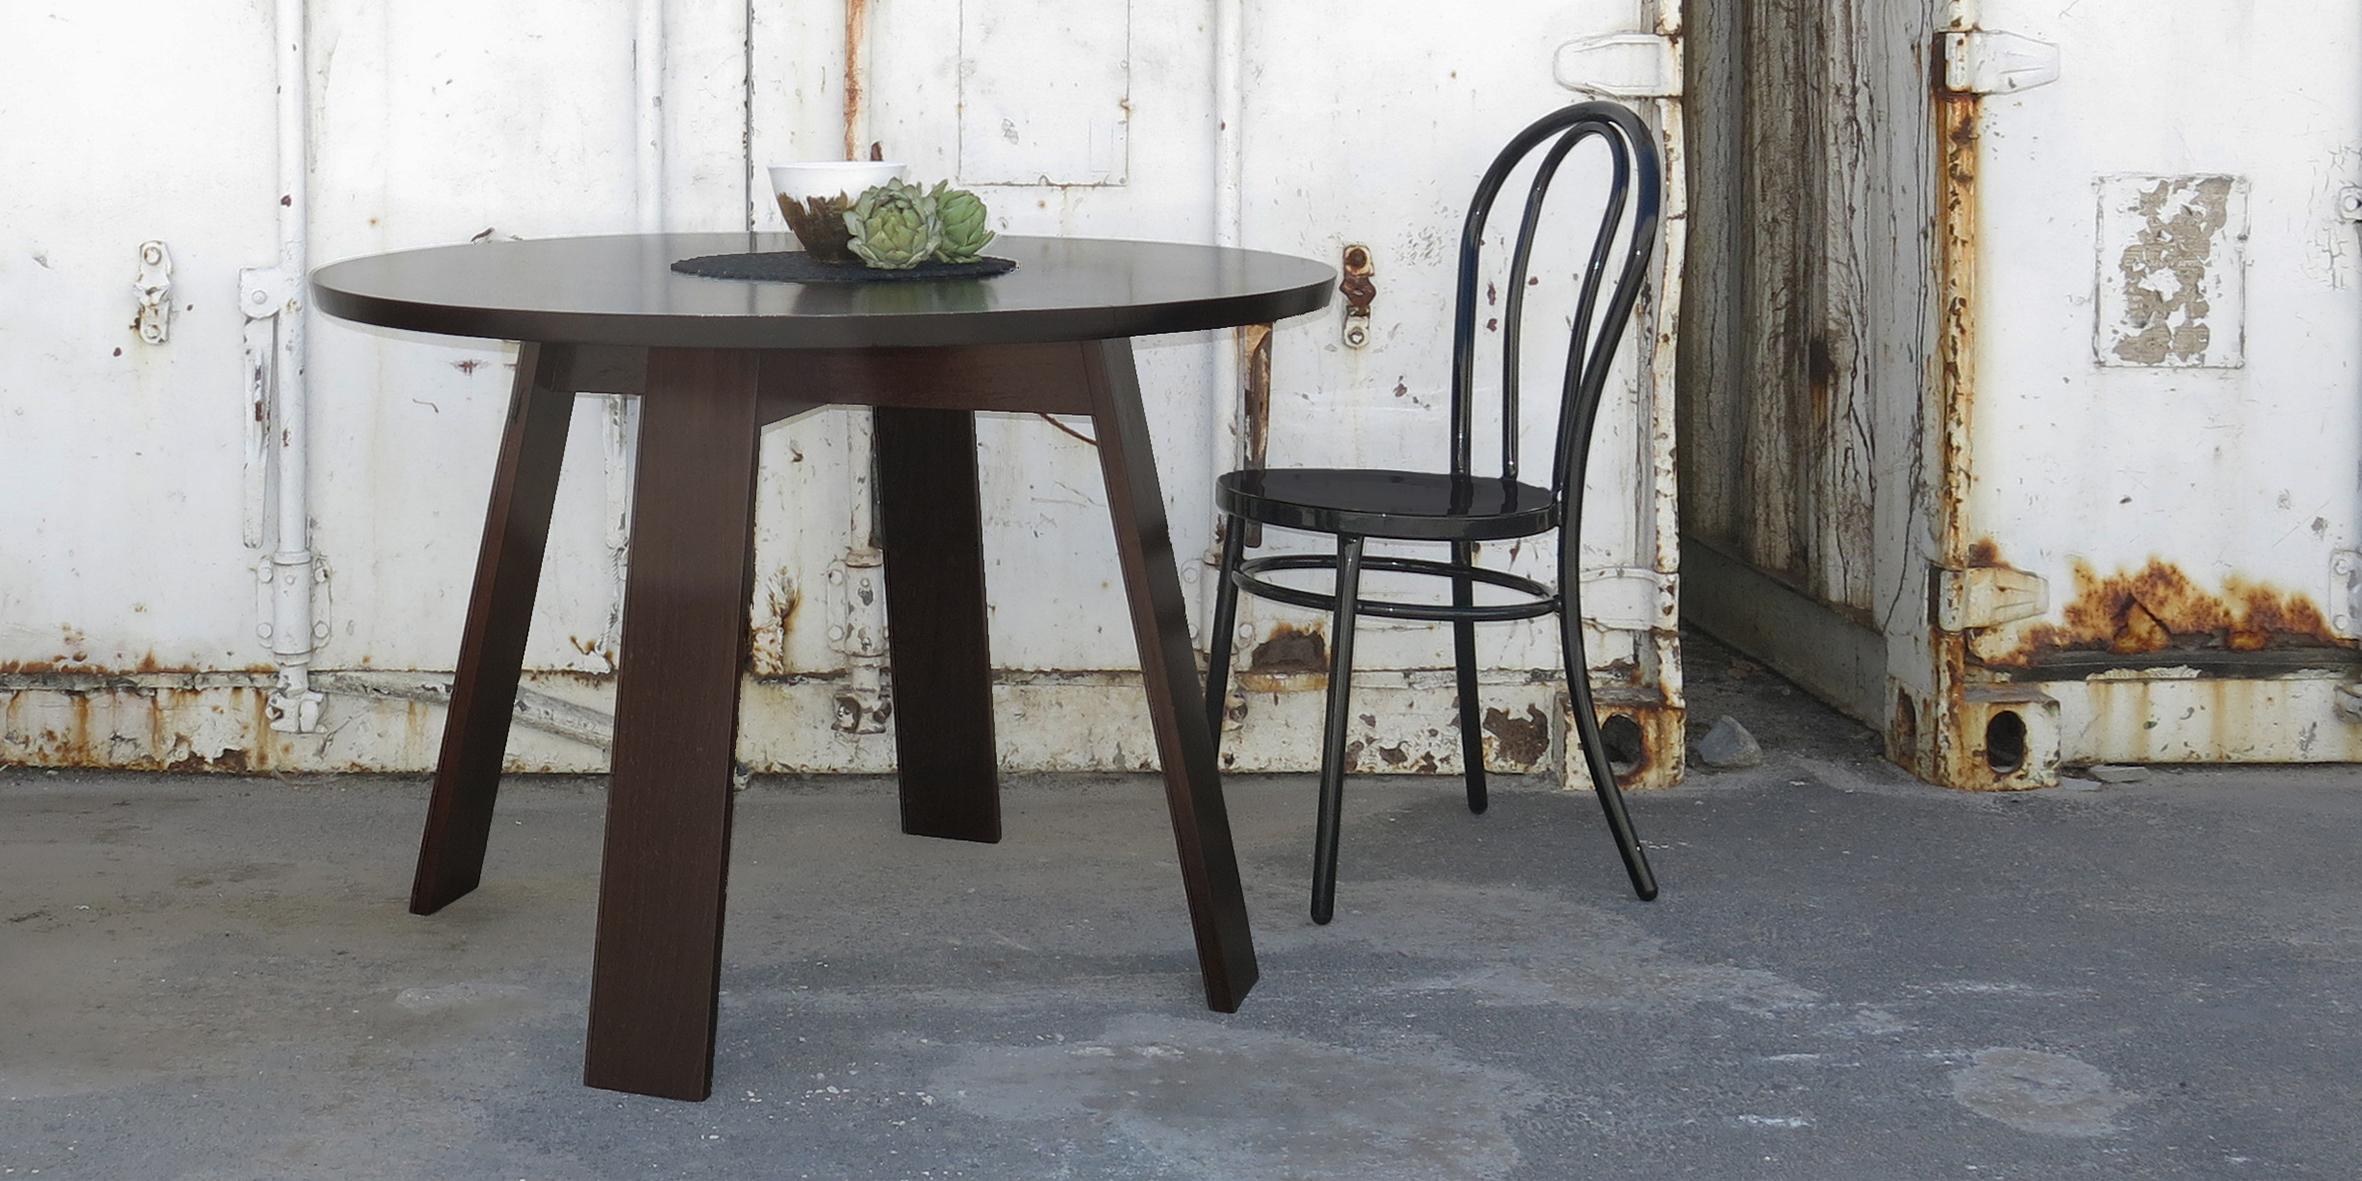 meisie table, 1100 dia x 730, wenge